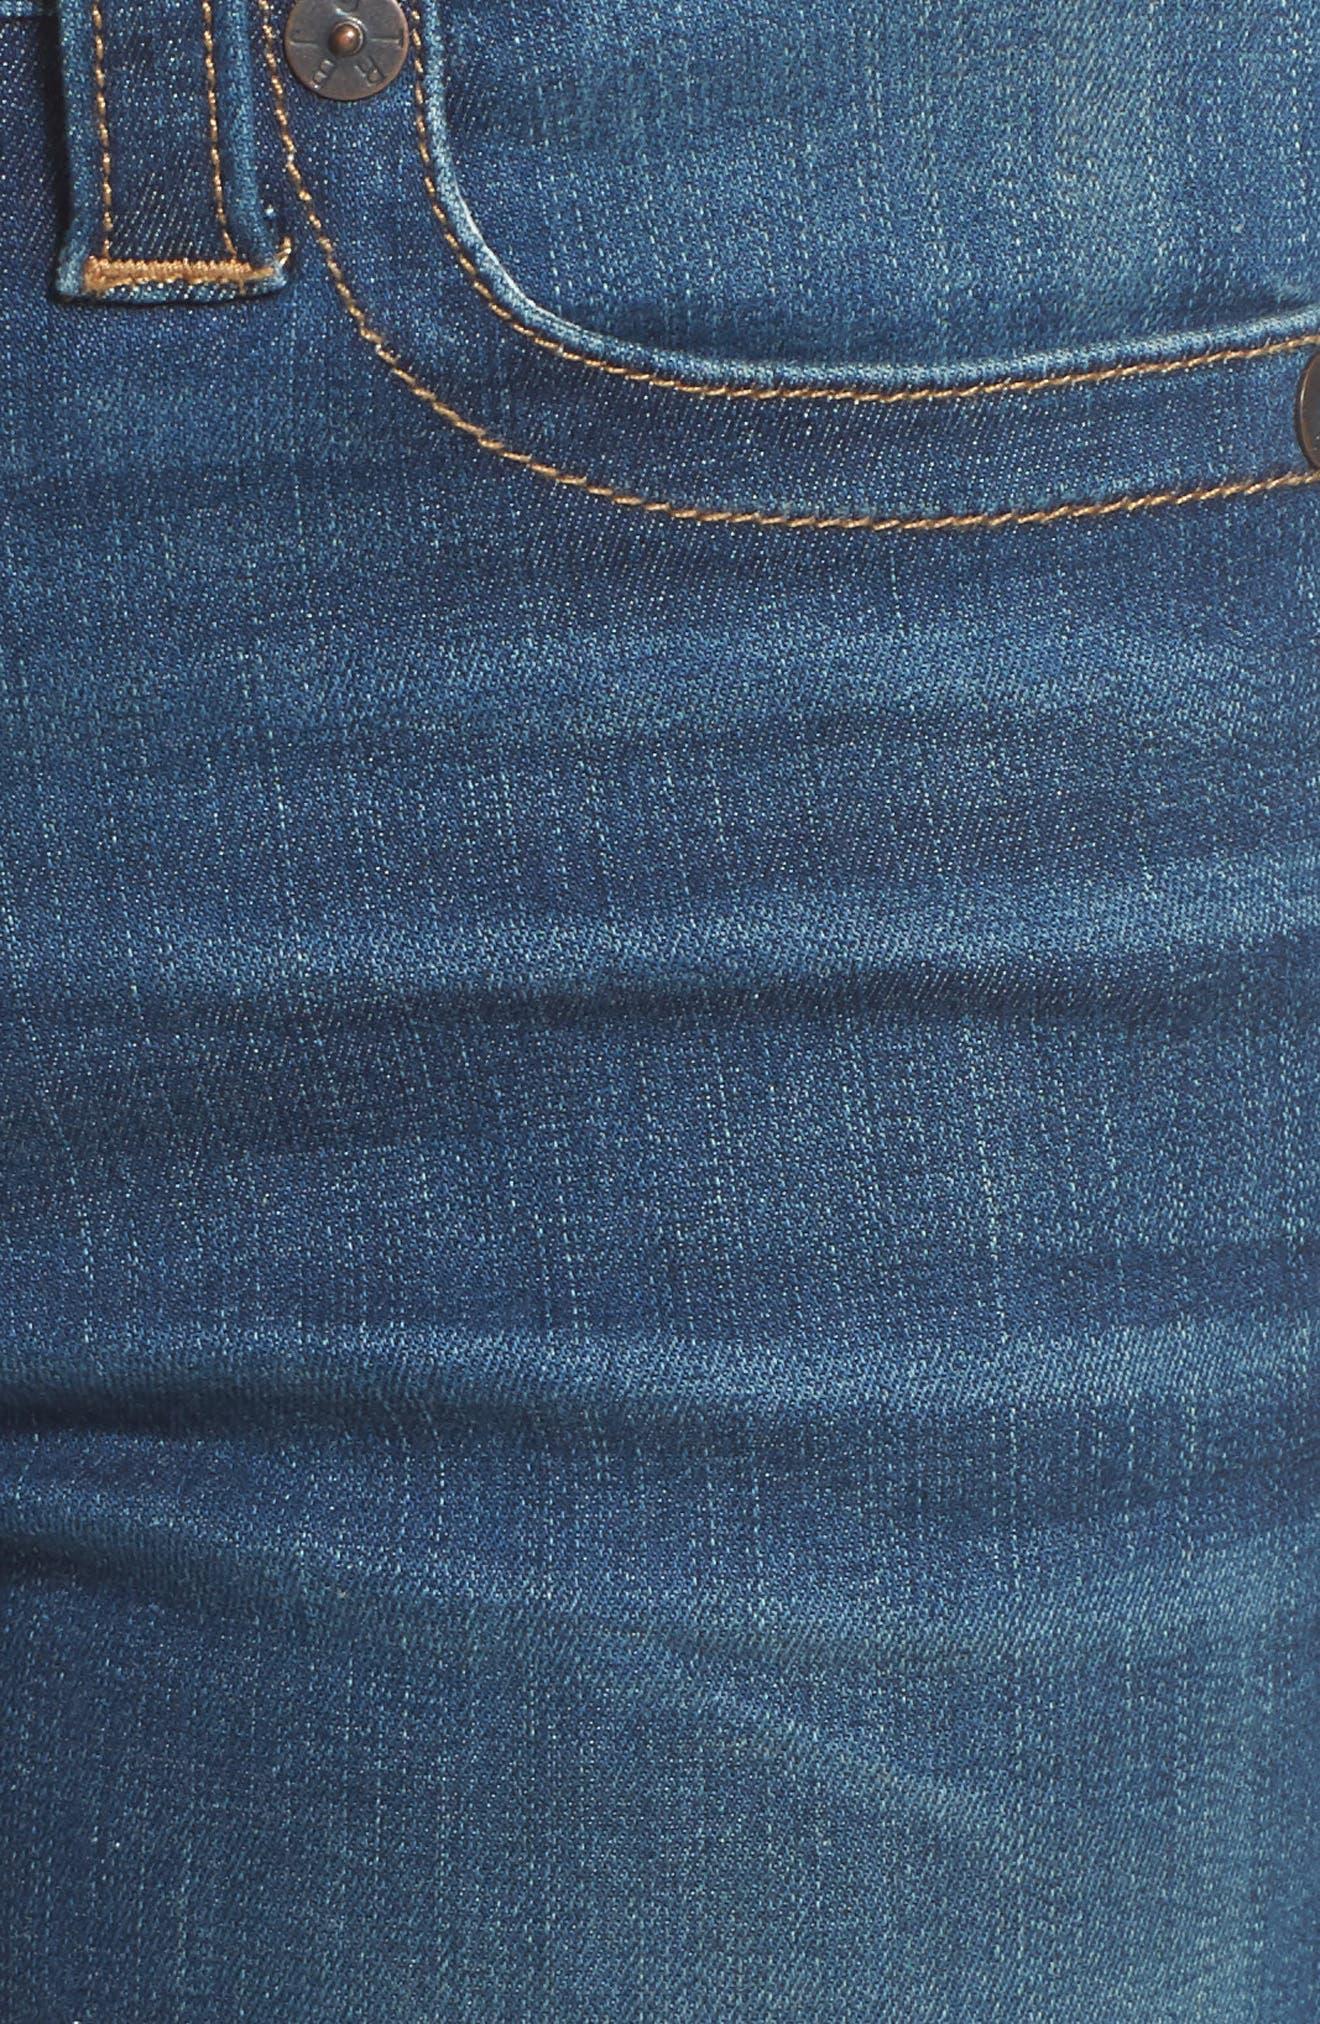 Halle Super Skinny Jeans,                             Alternate thumbnail 6, color,